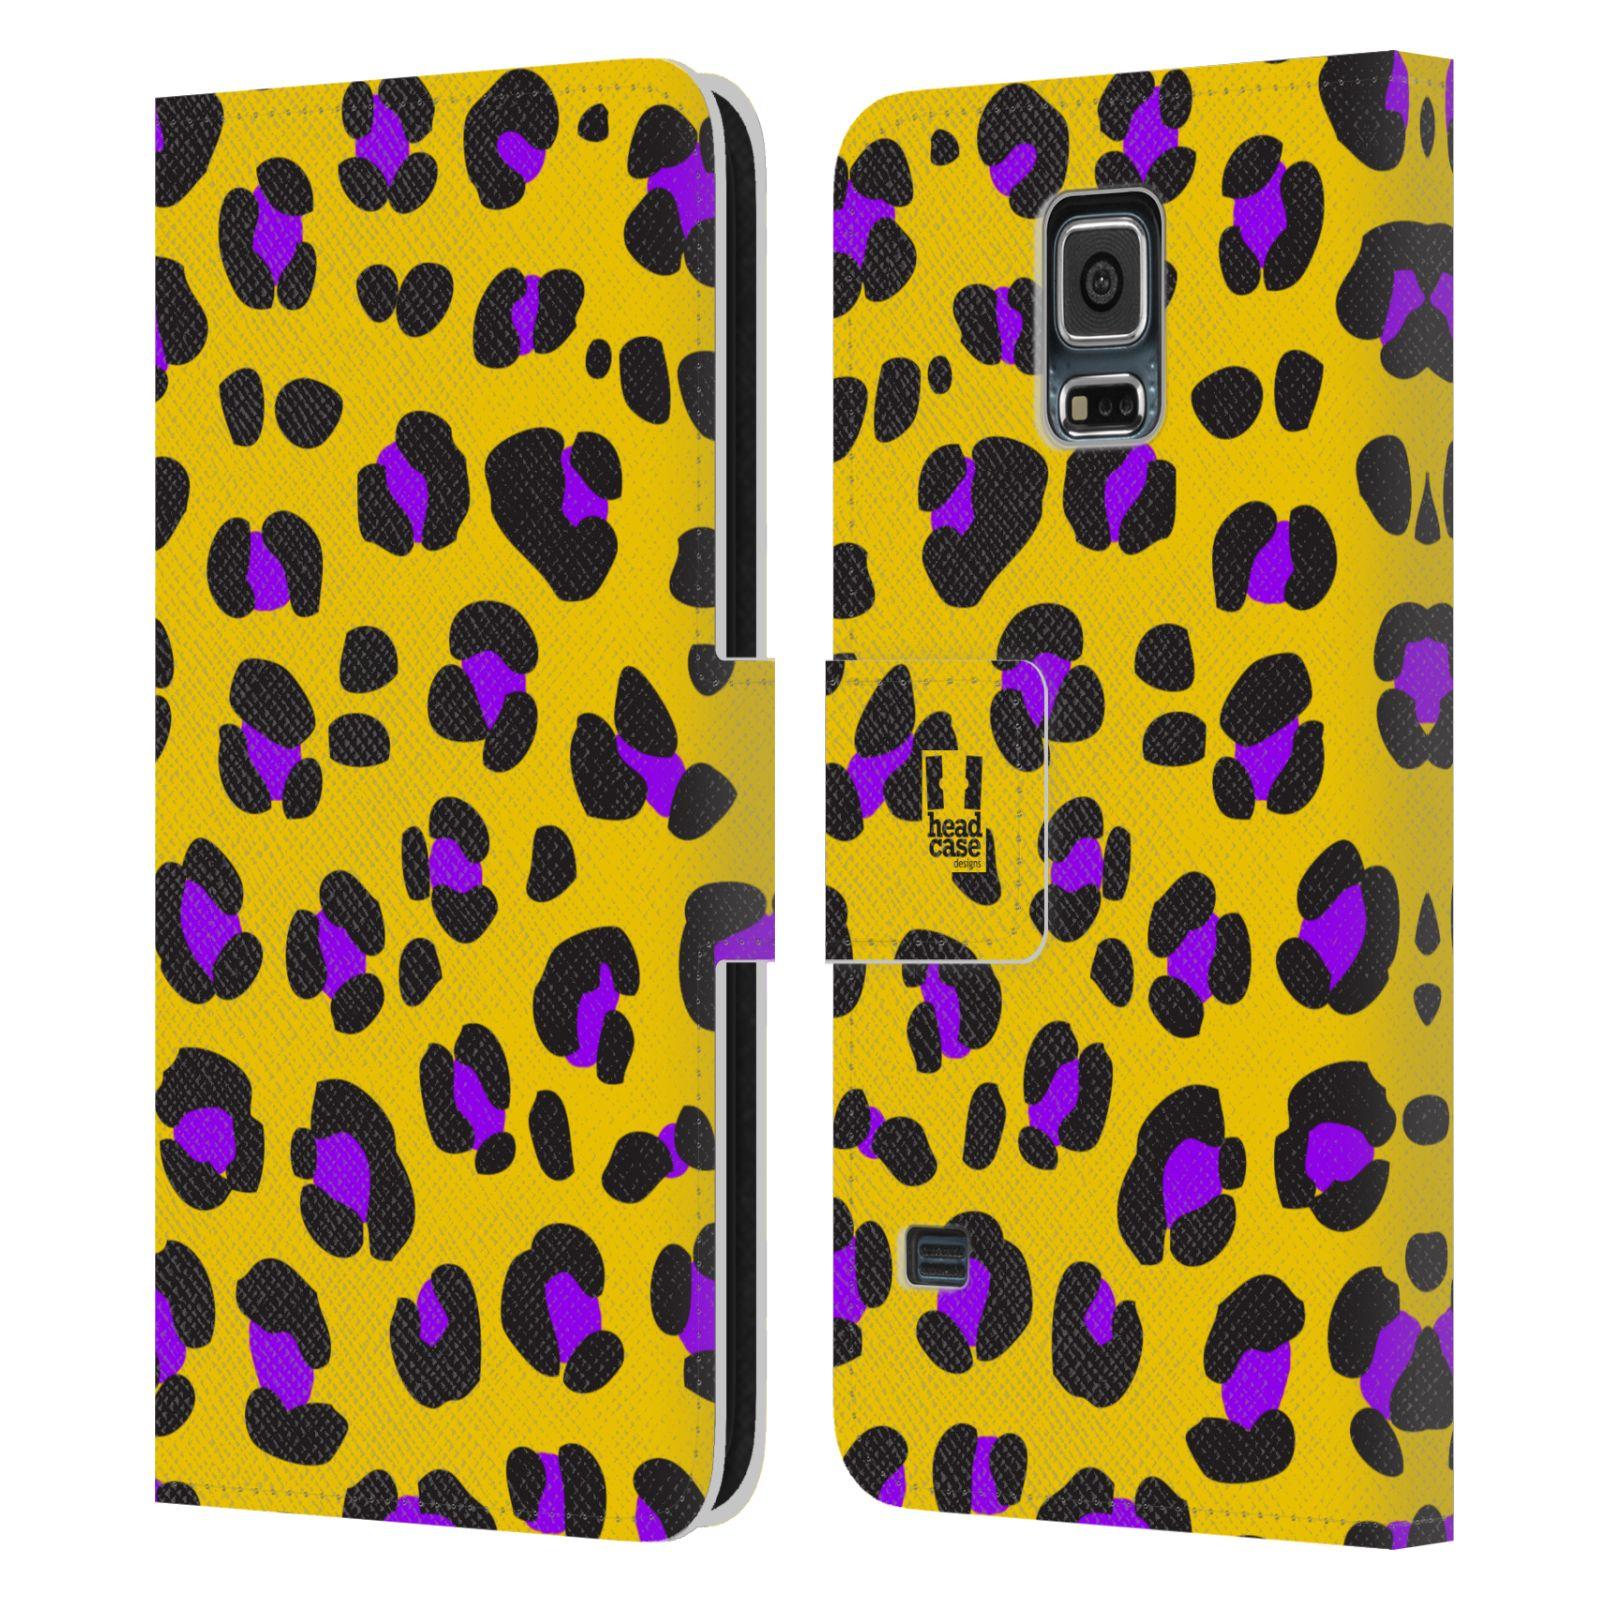 HEAD CASE Flipové pouzdro pro mobil Samsung Galaxy S5 / S5 NEO Zvířecí barevné vzory žlutý leopard fialové skvrny